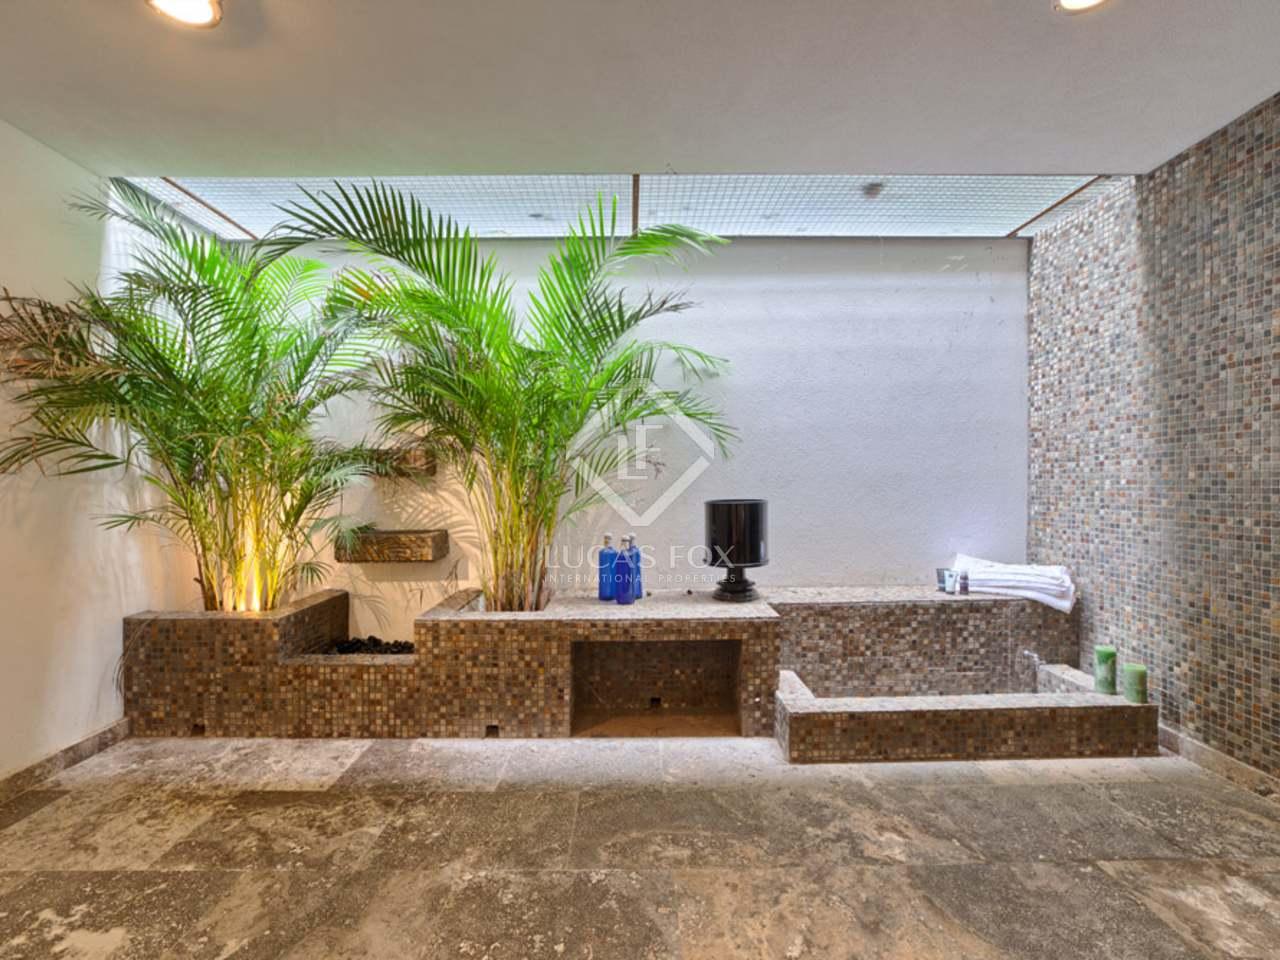 446m haus villa mit 226m terrasse zum verkauf in nueva andaluc a. Black Bedroom Furniture Sets. Home Design Ideas